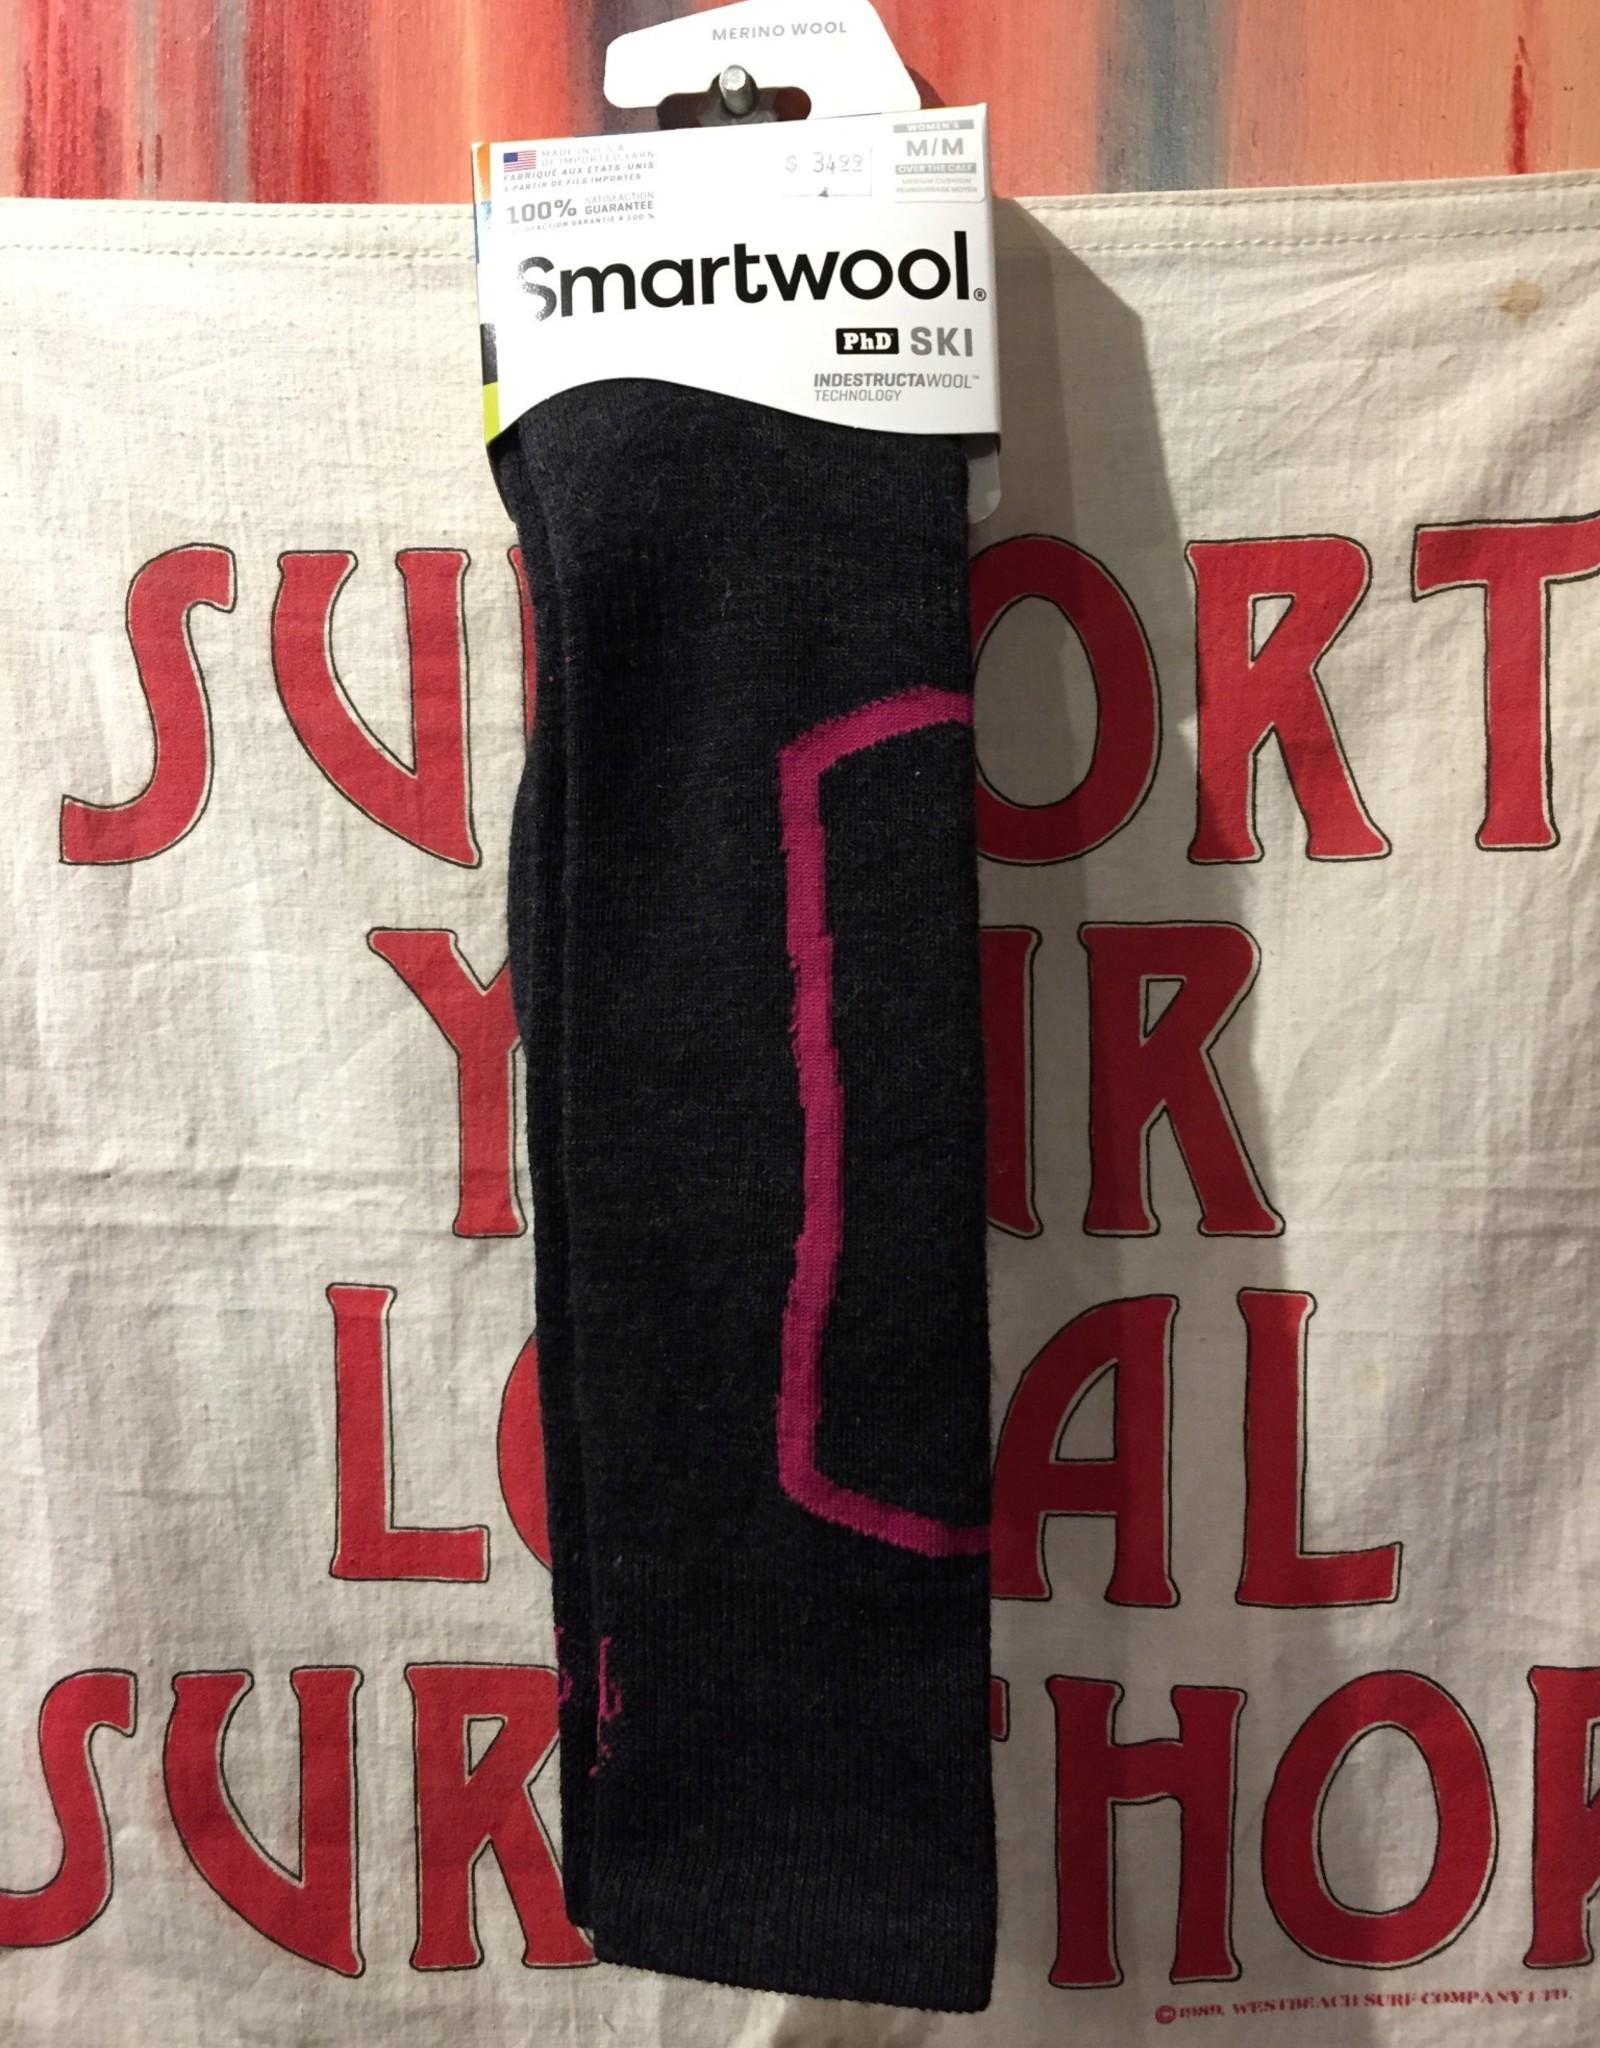 Smartwool Wm Phd Ski Sock